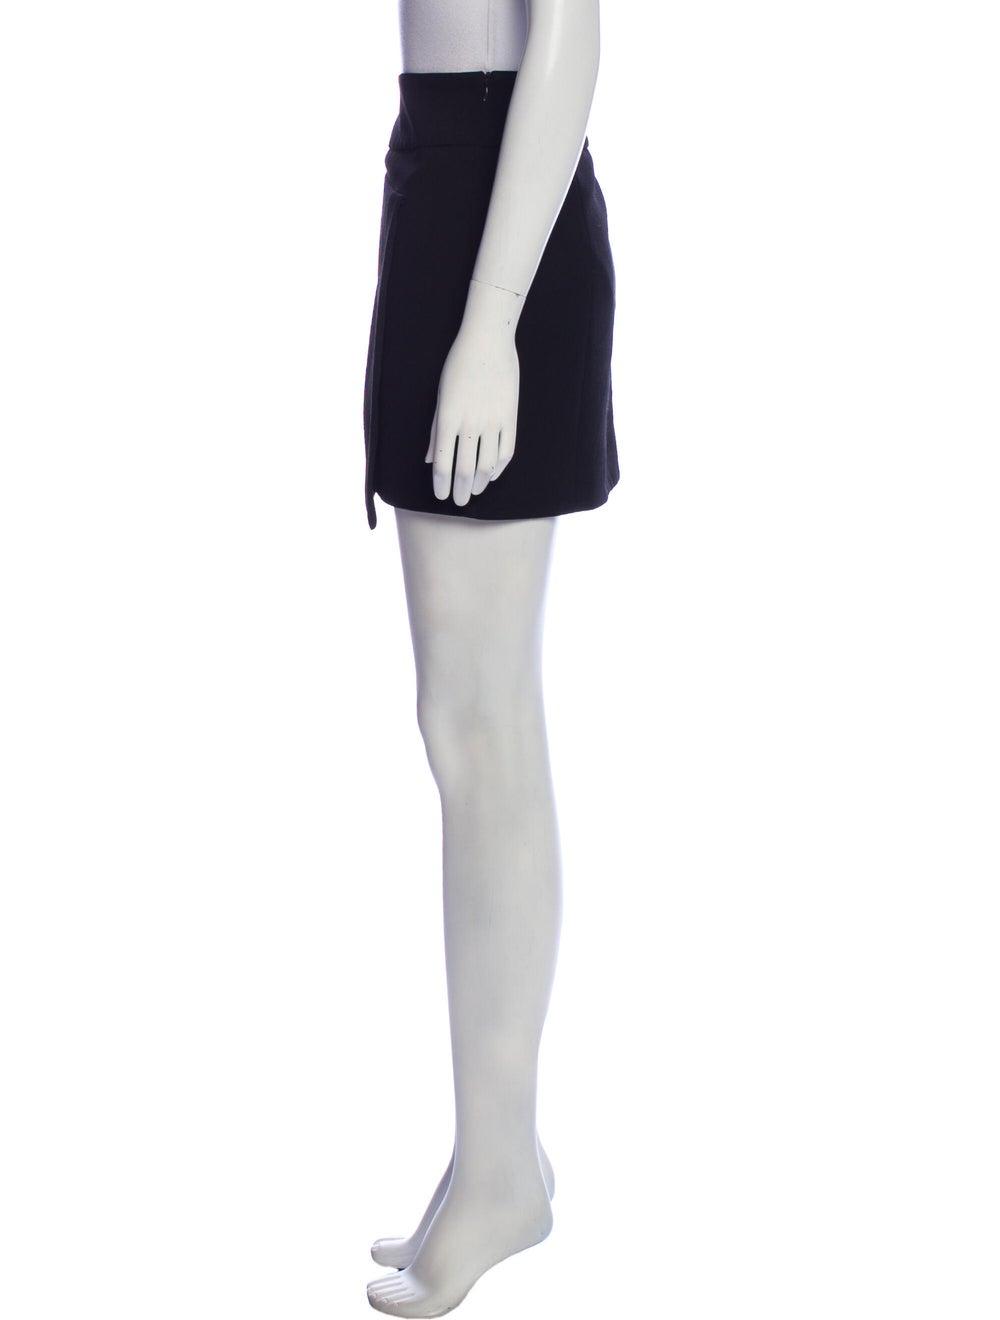 Vince Mini Skirt Black - image 2